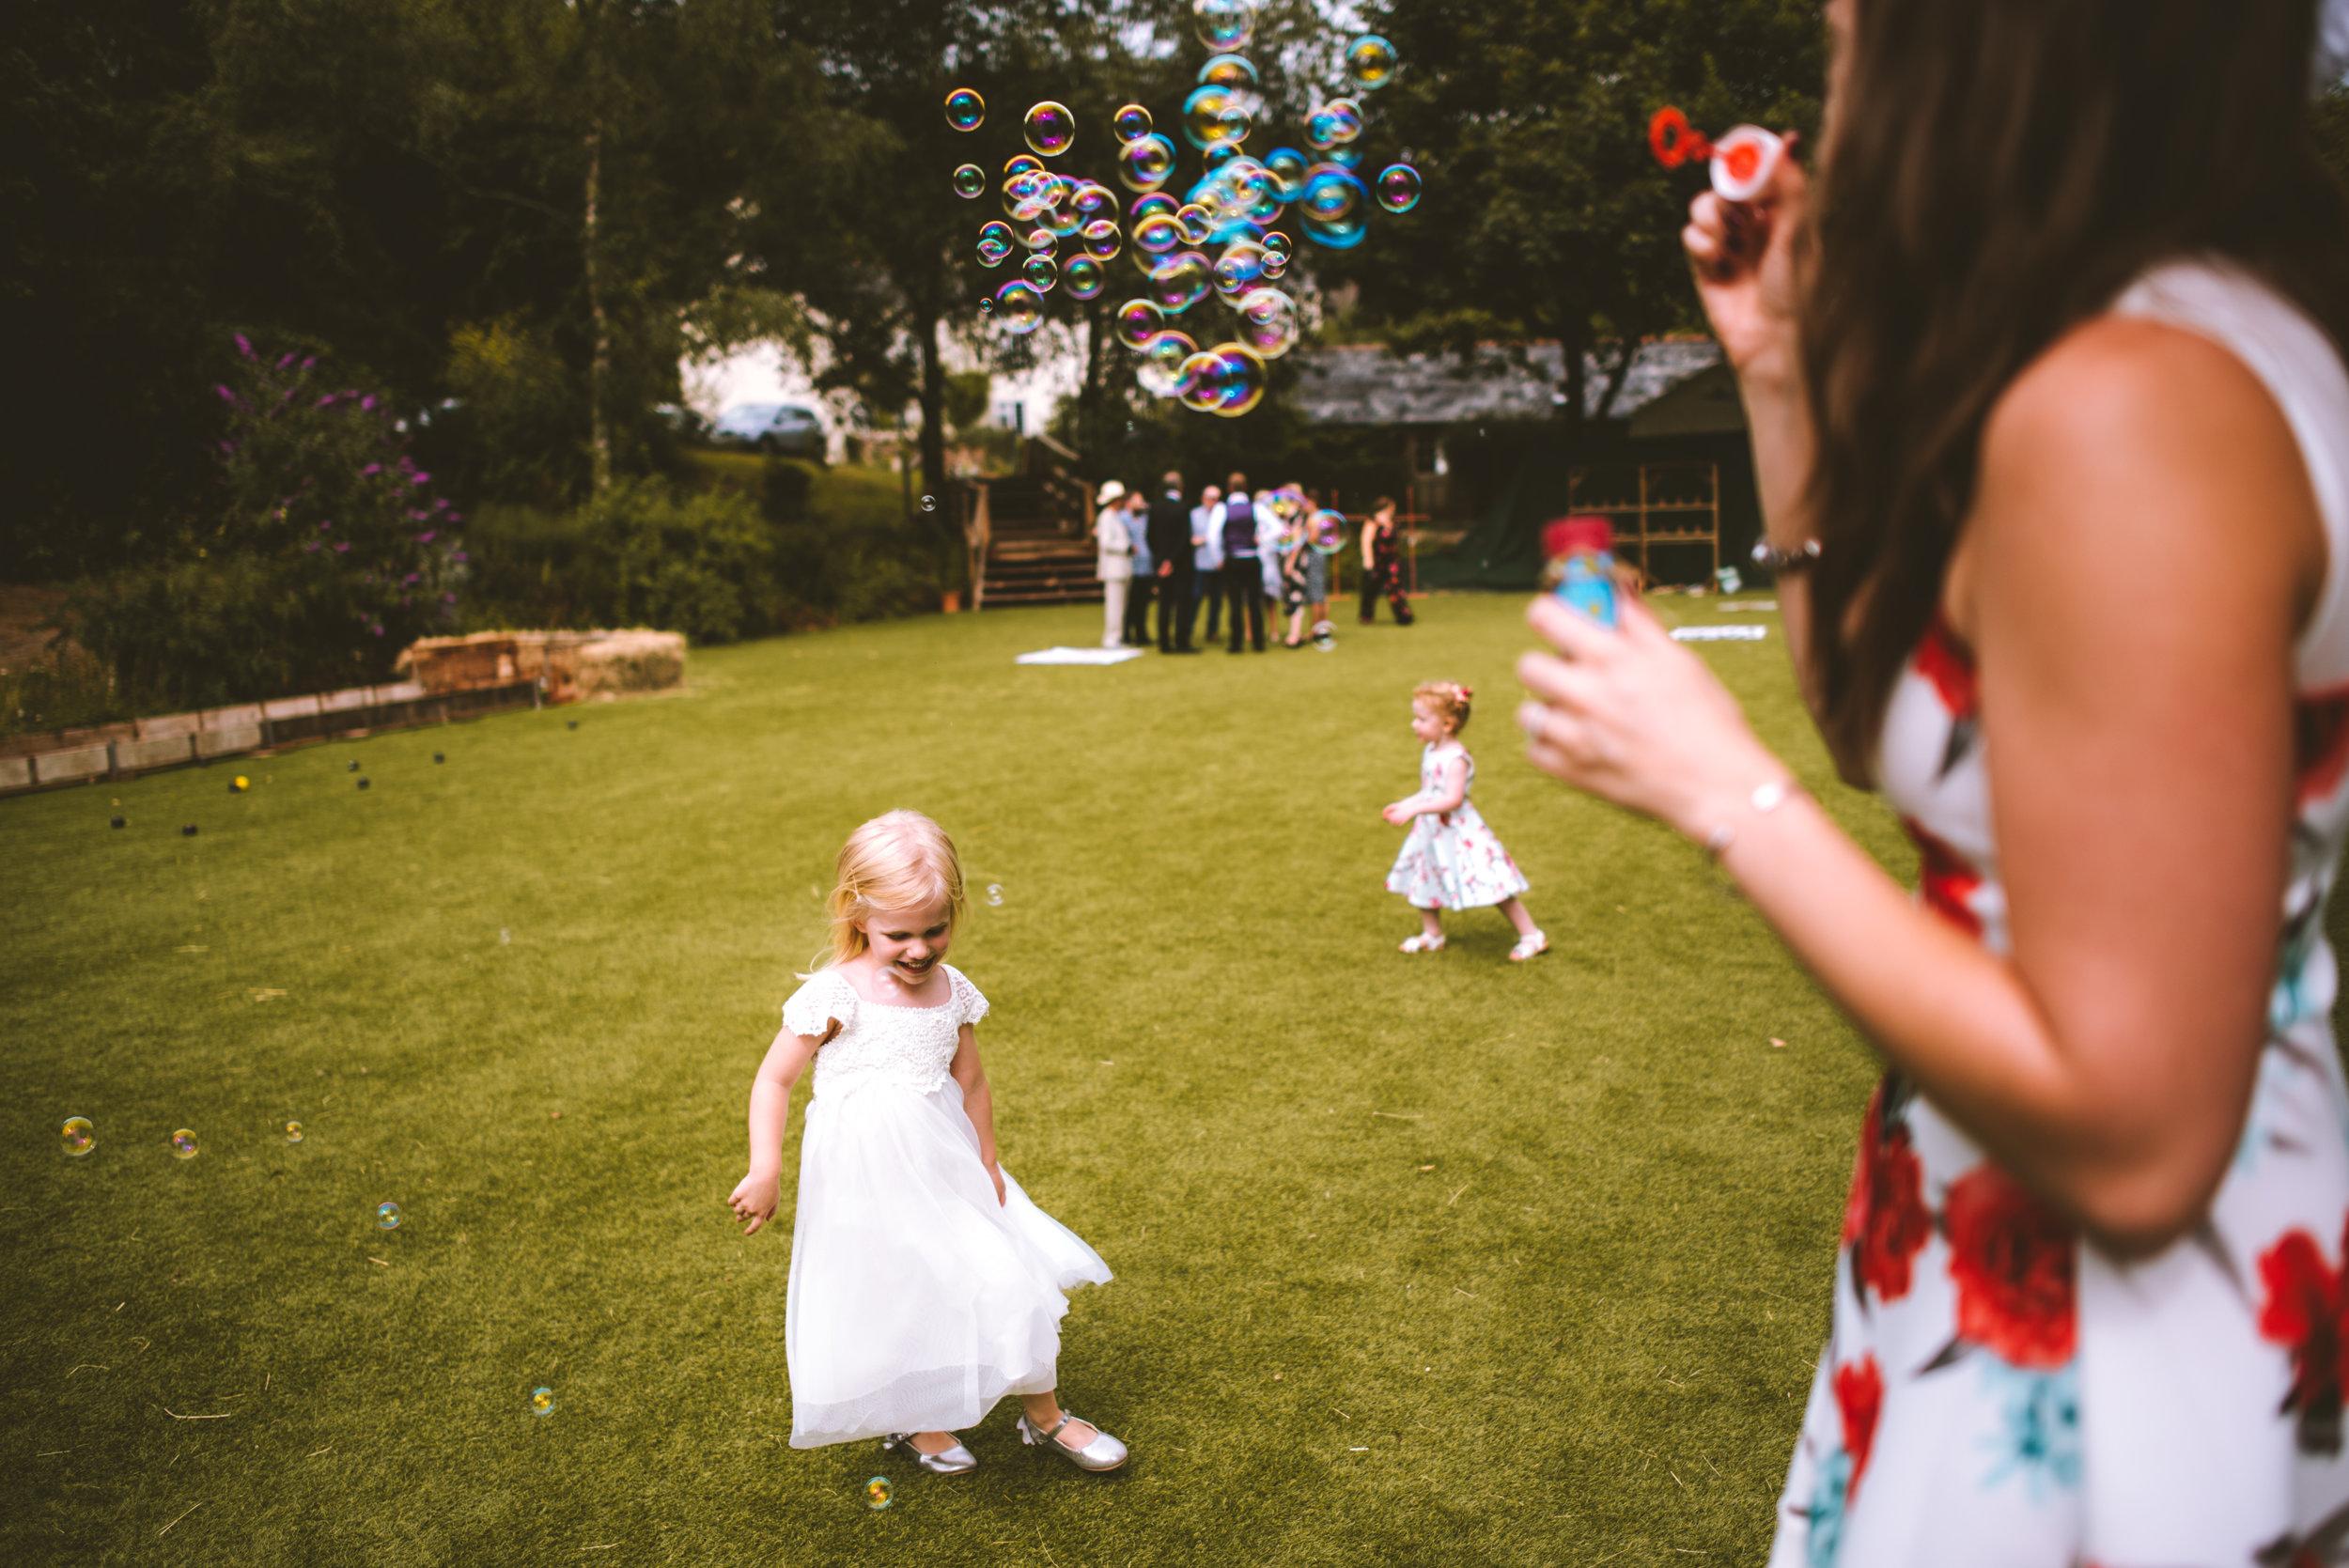 deers-leap-wedding-photographer-63.jpg